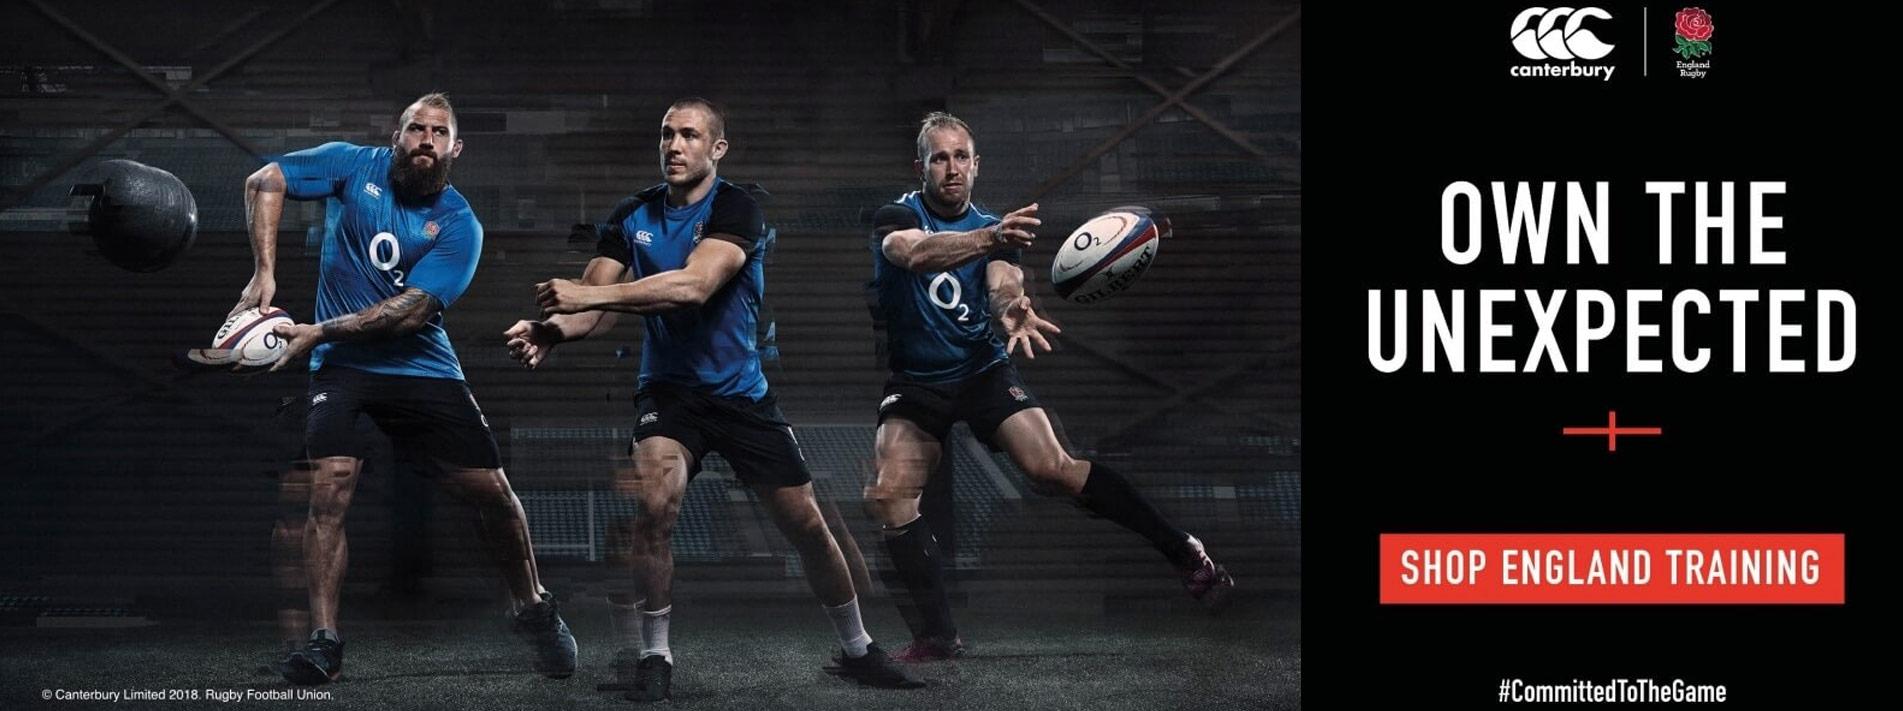 Canterbury Rugby Italia